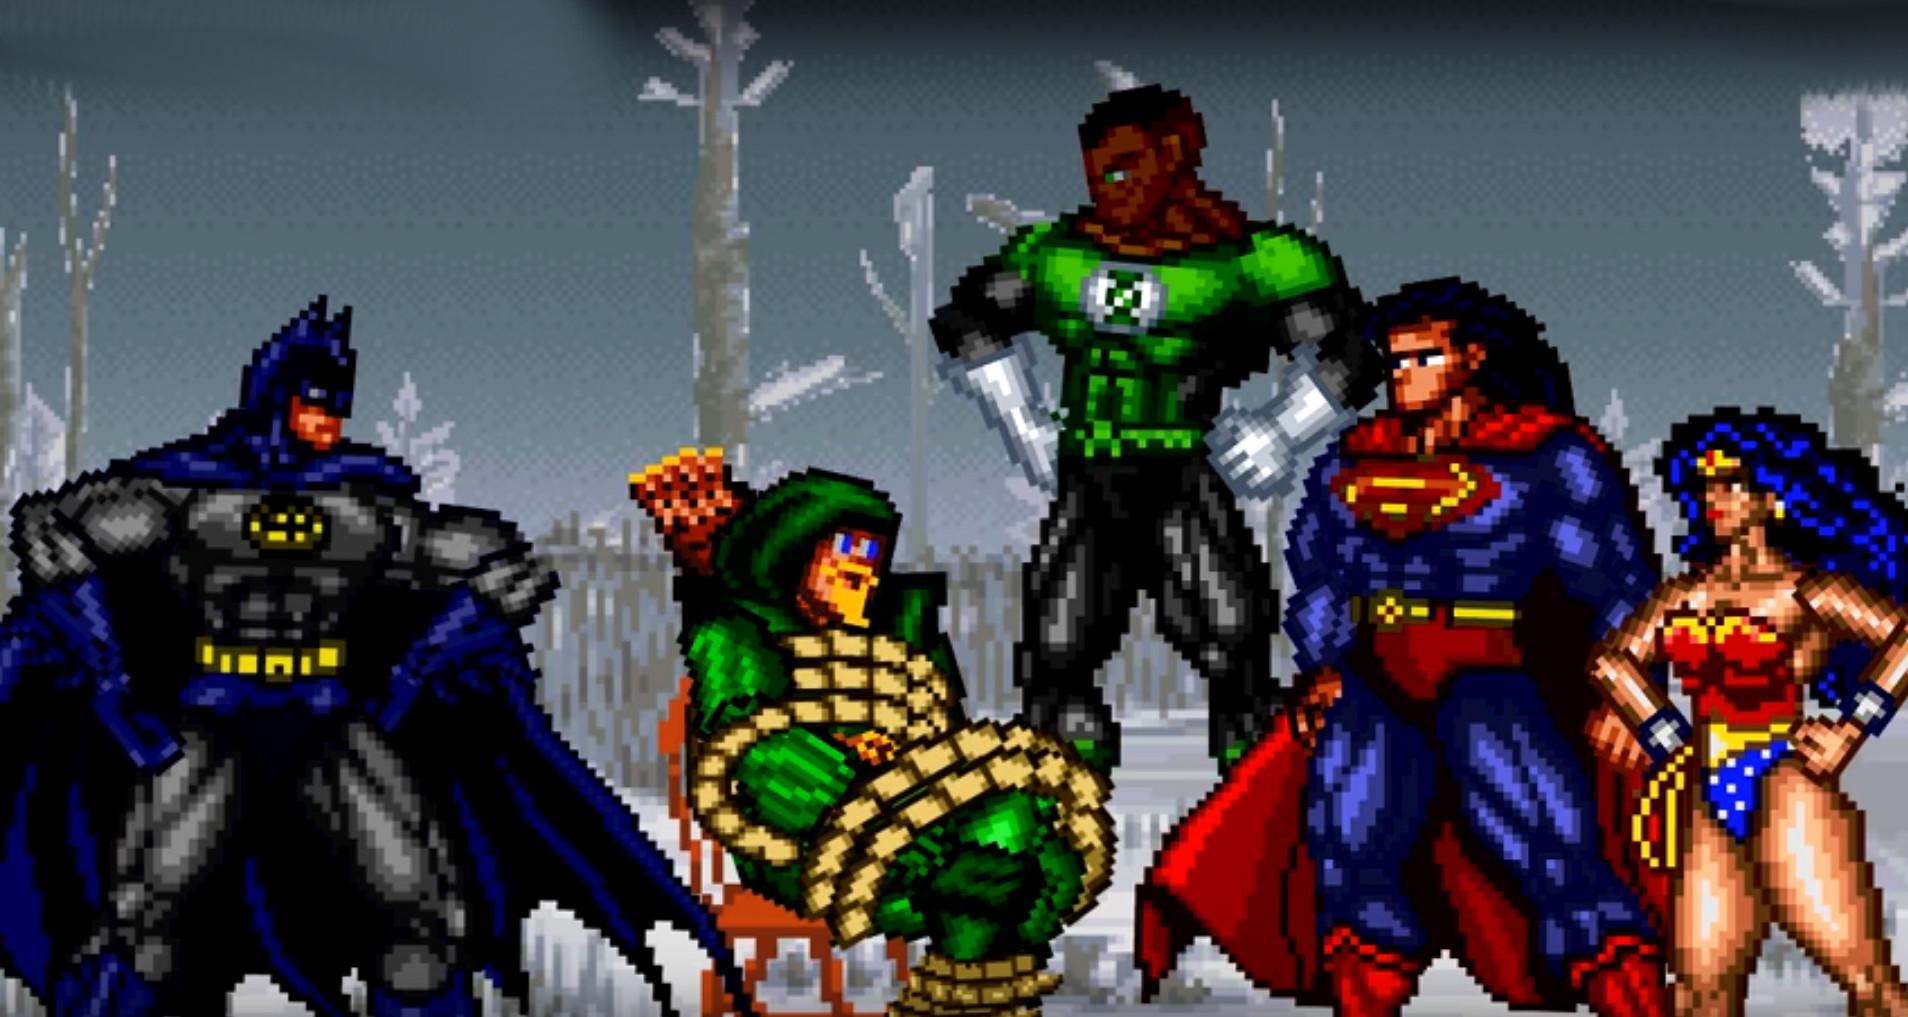 8-Bit Justice League